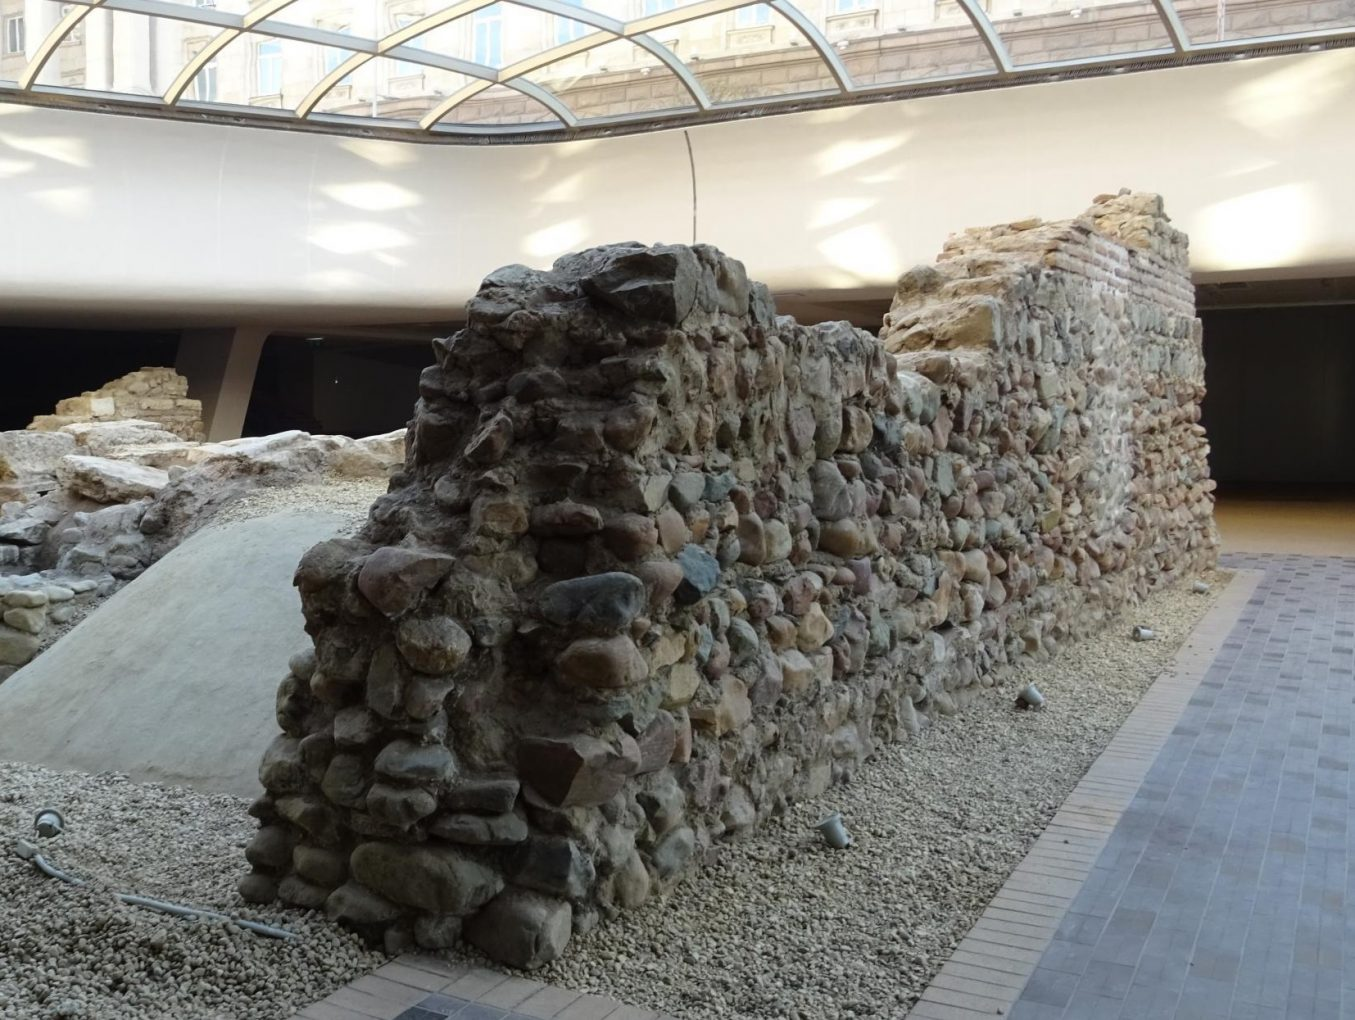 Софийско пътешествие из Античността